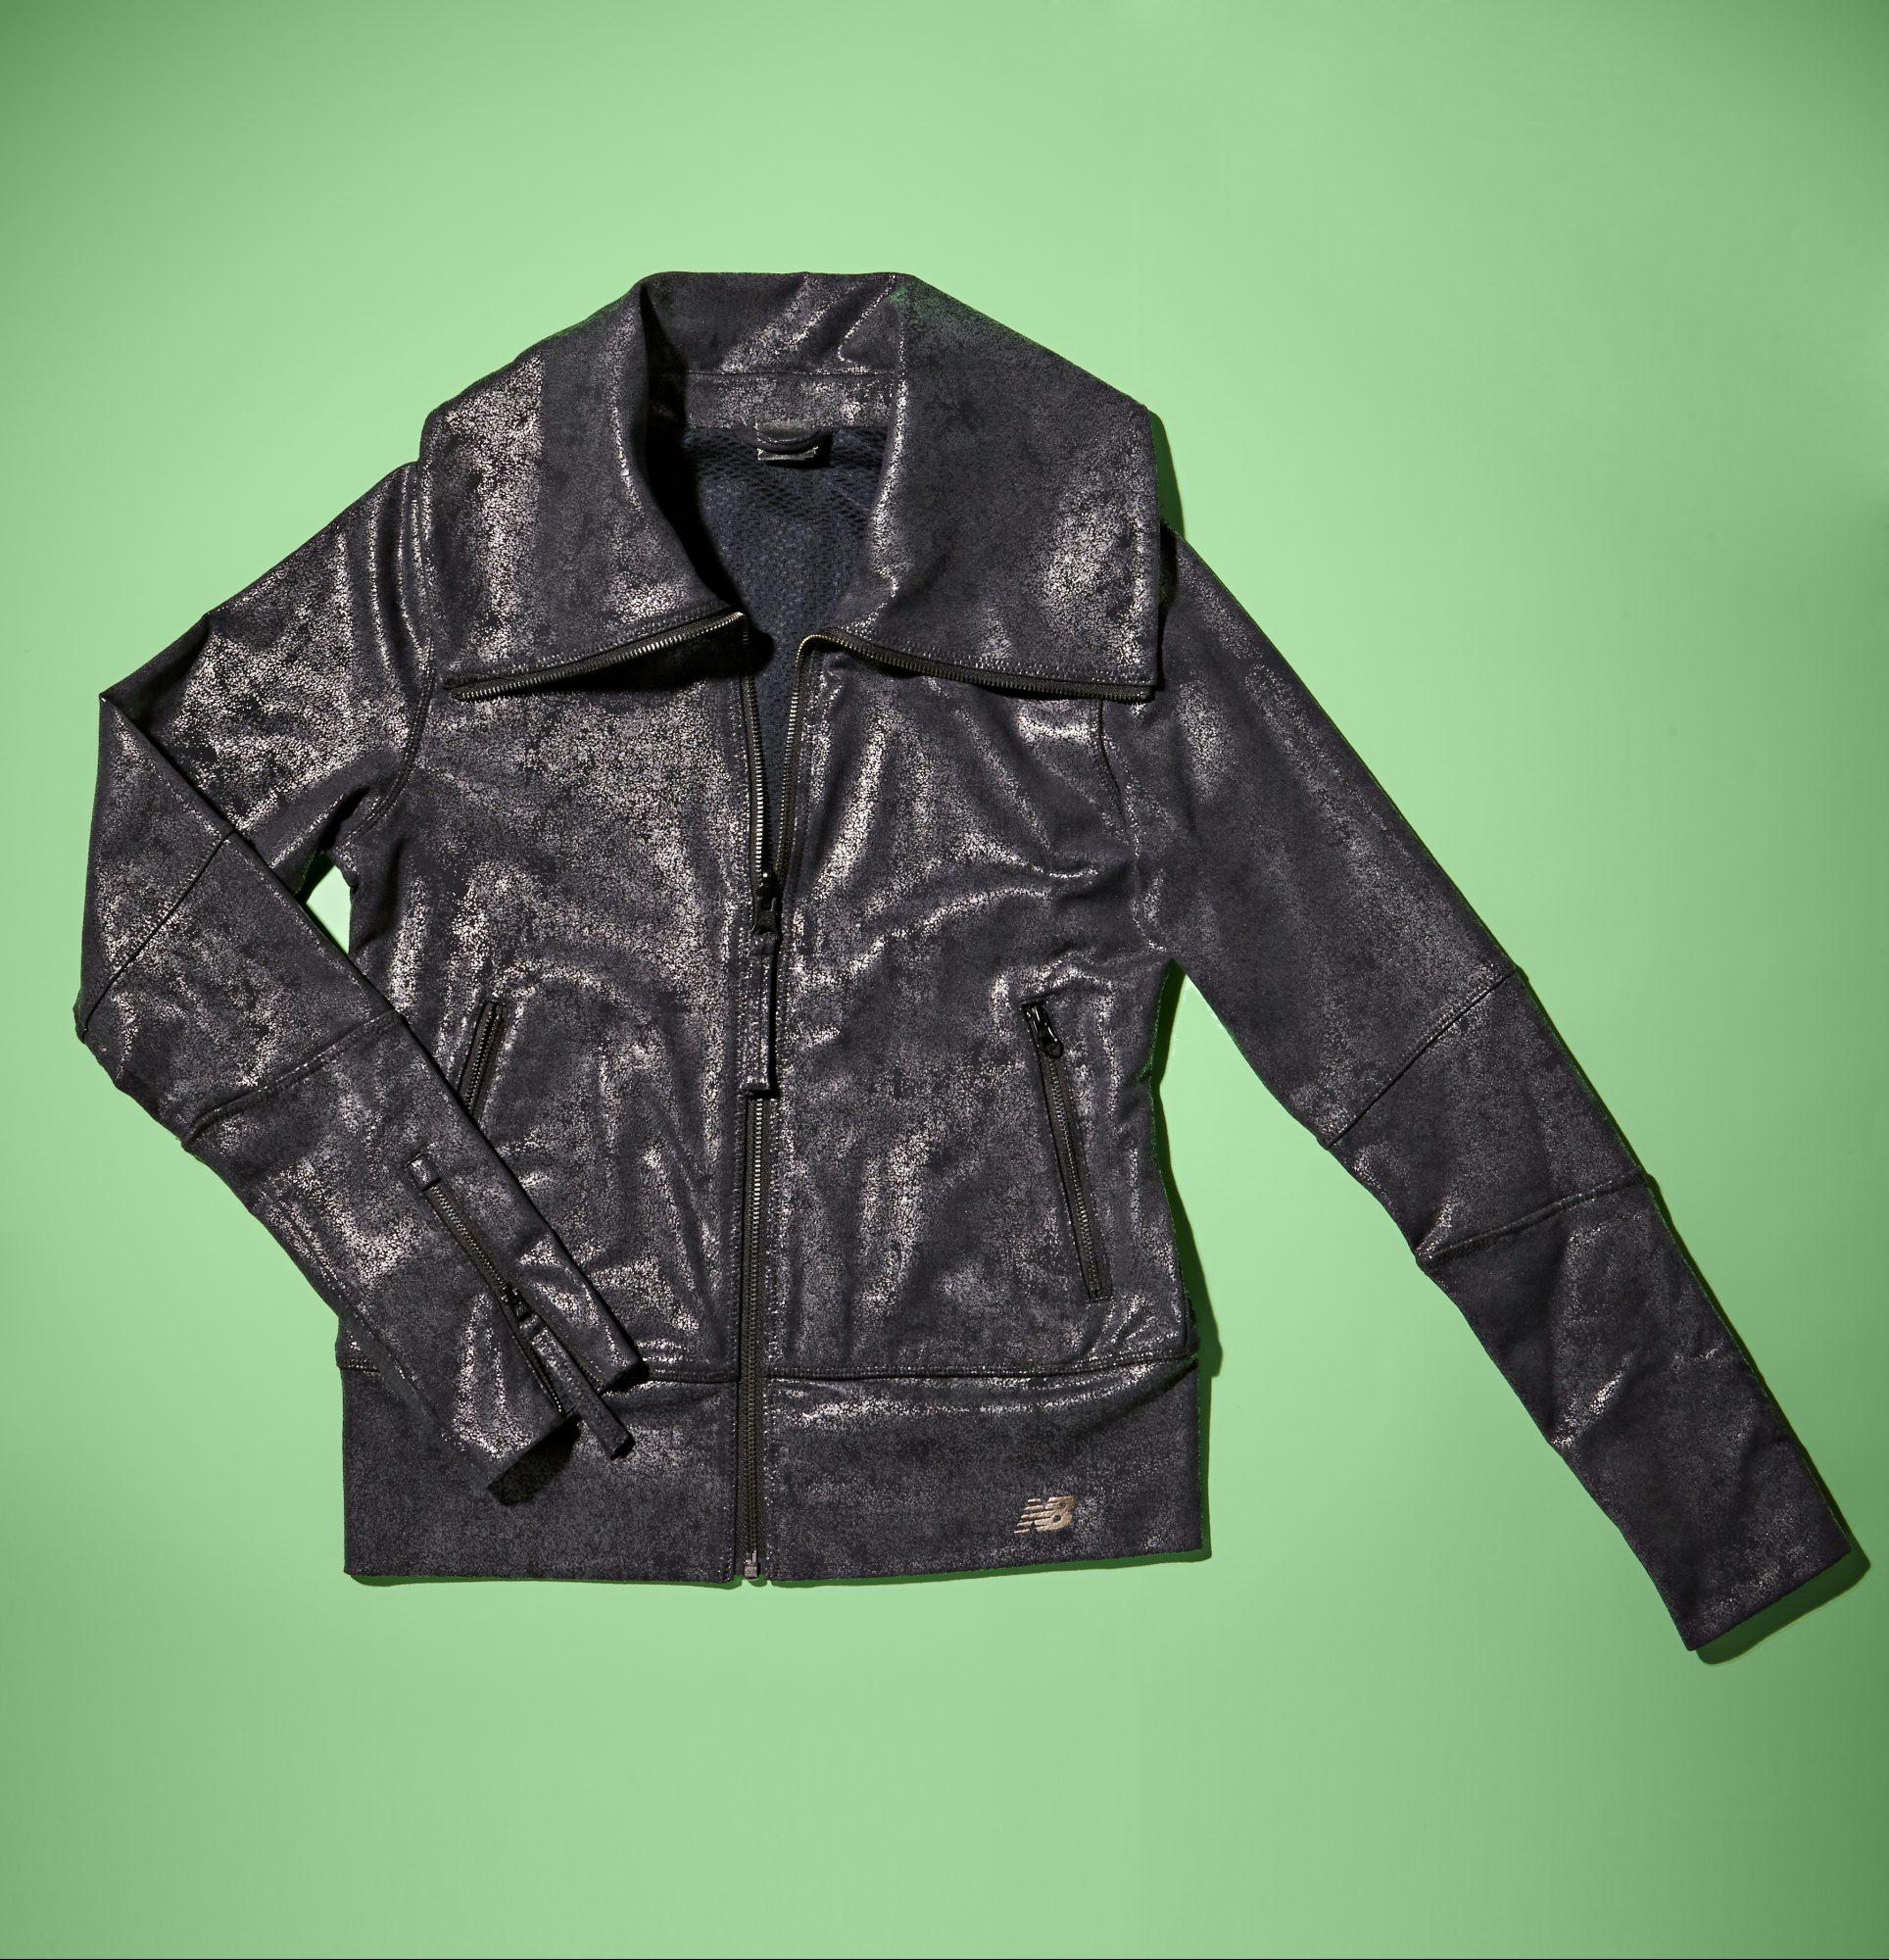 1216RRGFT_Jacket.jpg